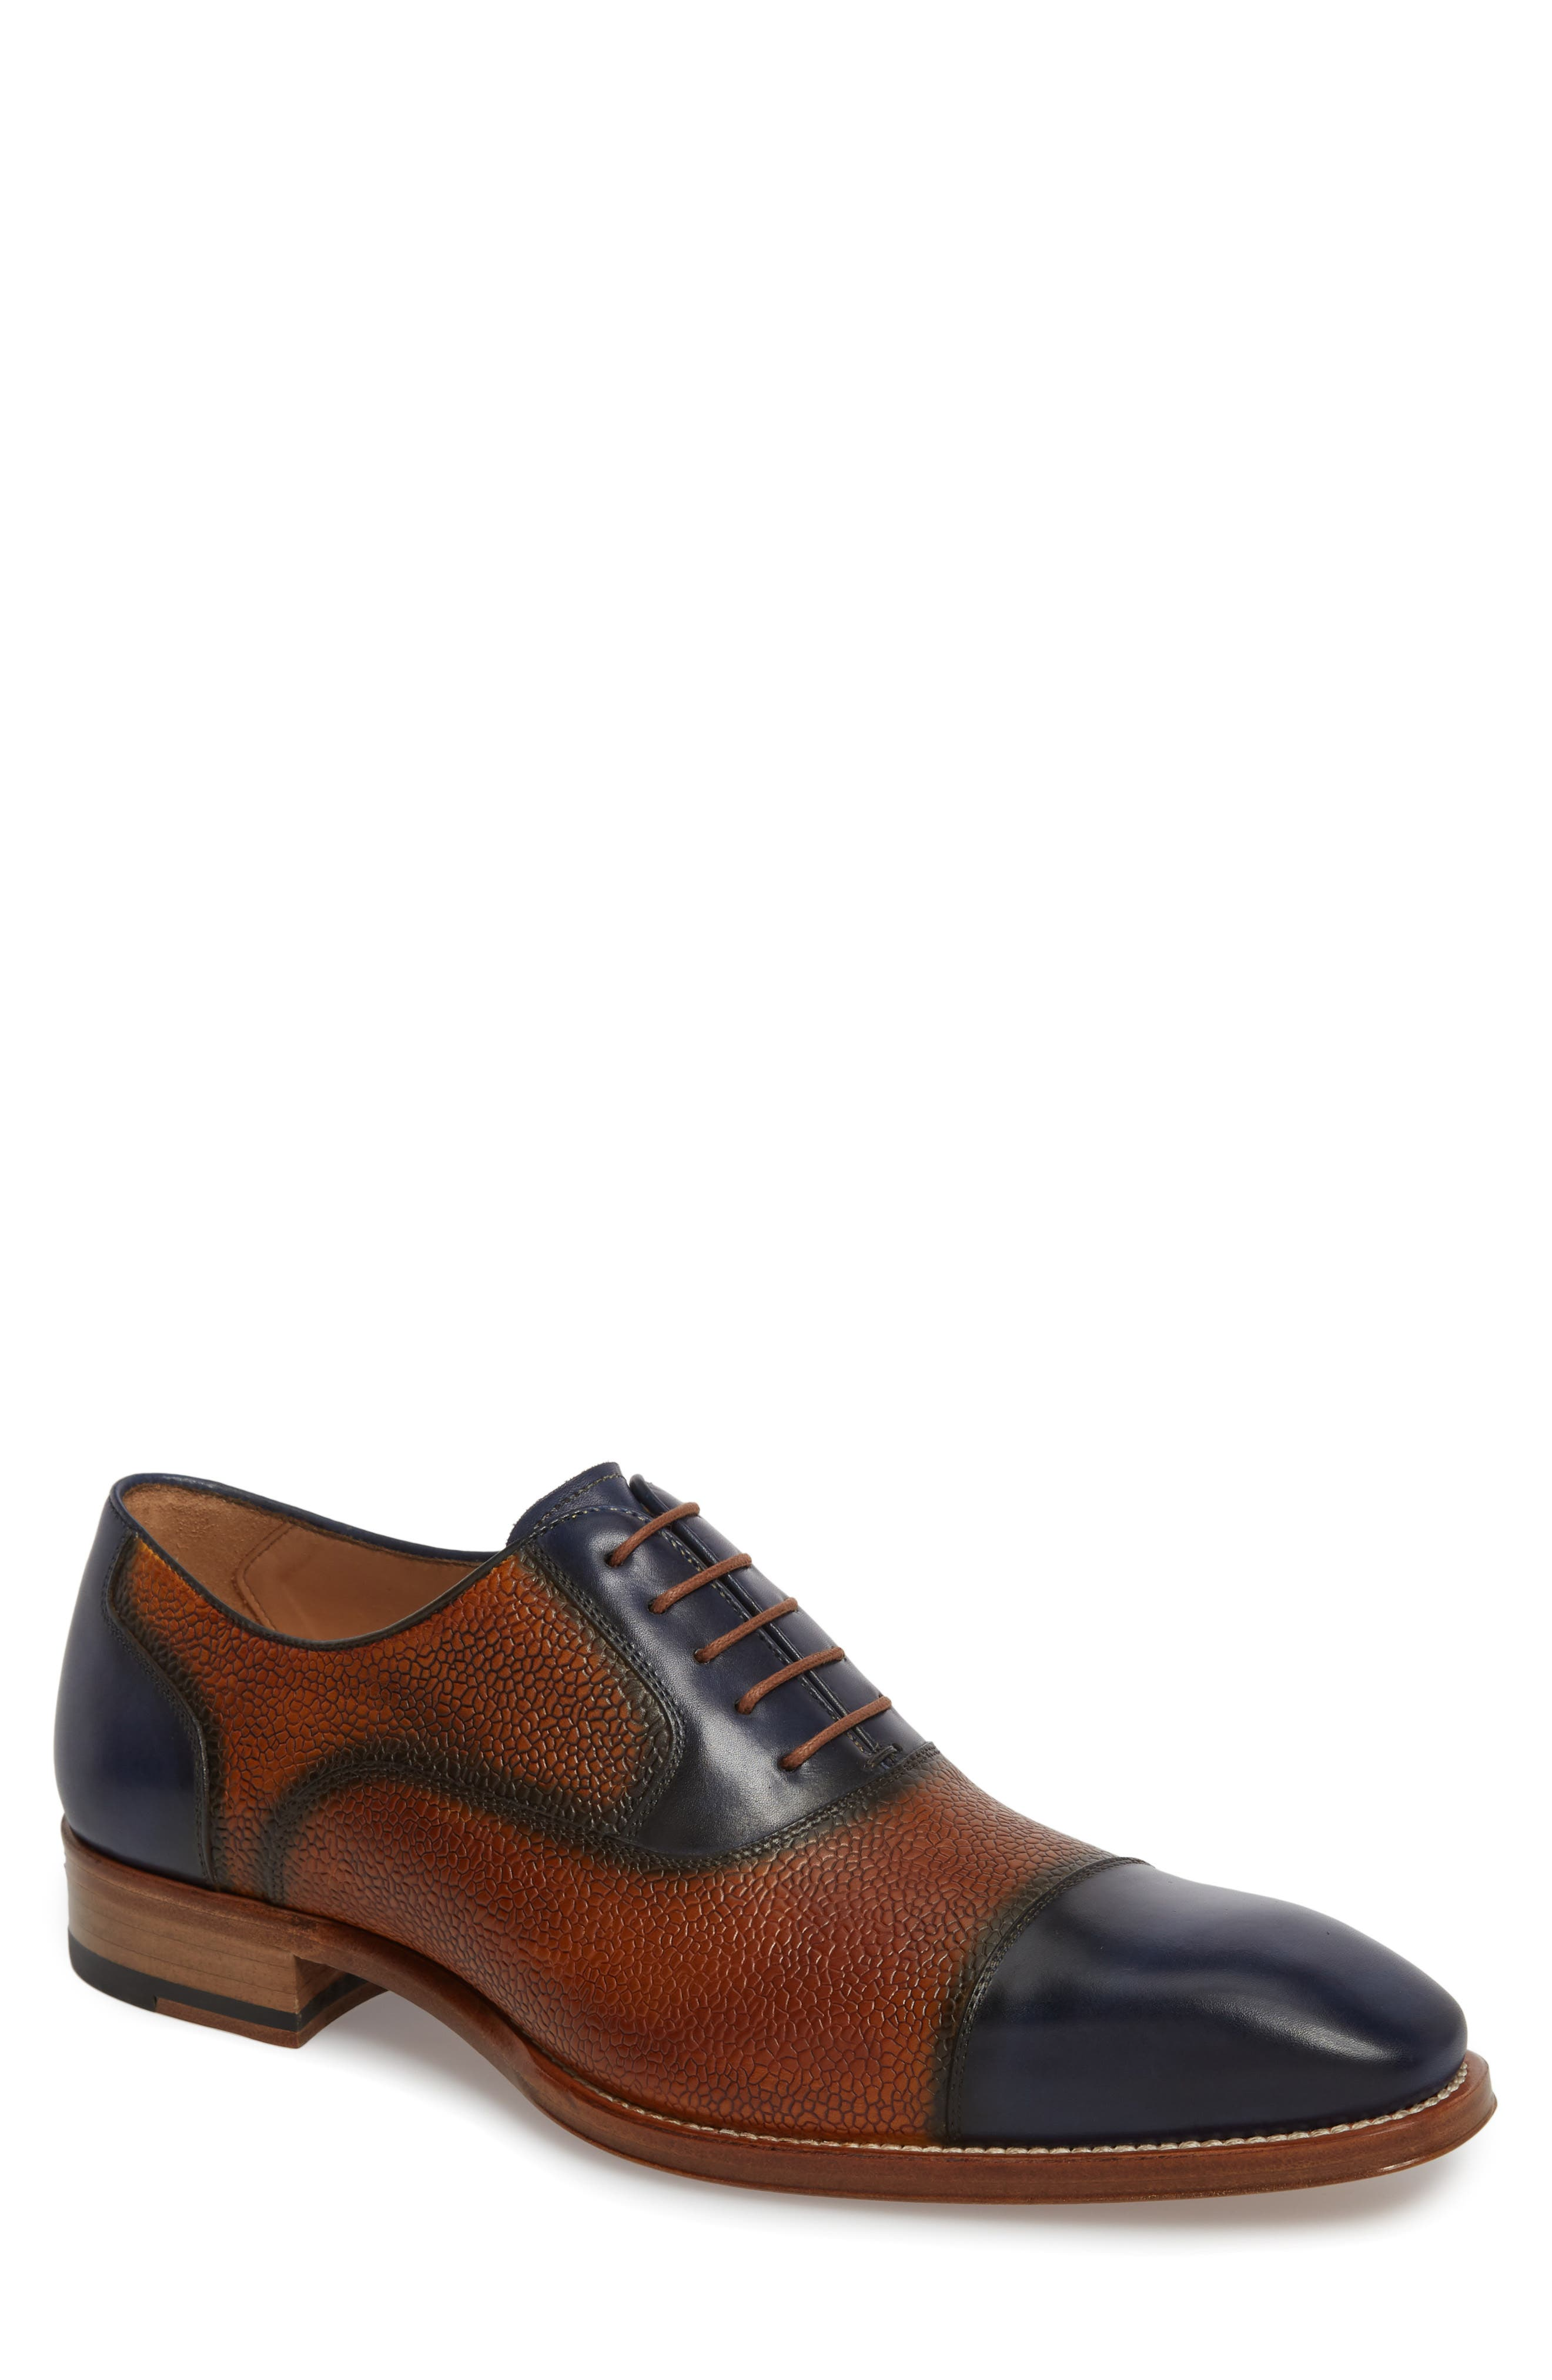 Verino Cap Toe Oxford,                             Main thumbnail 1, color,                             Blue/ Tan Leather